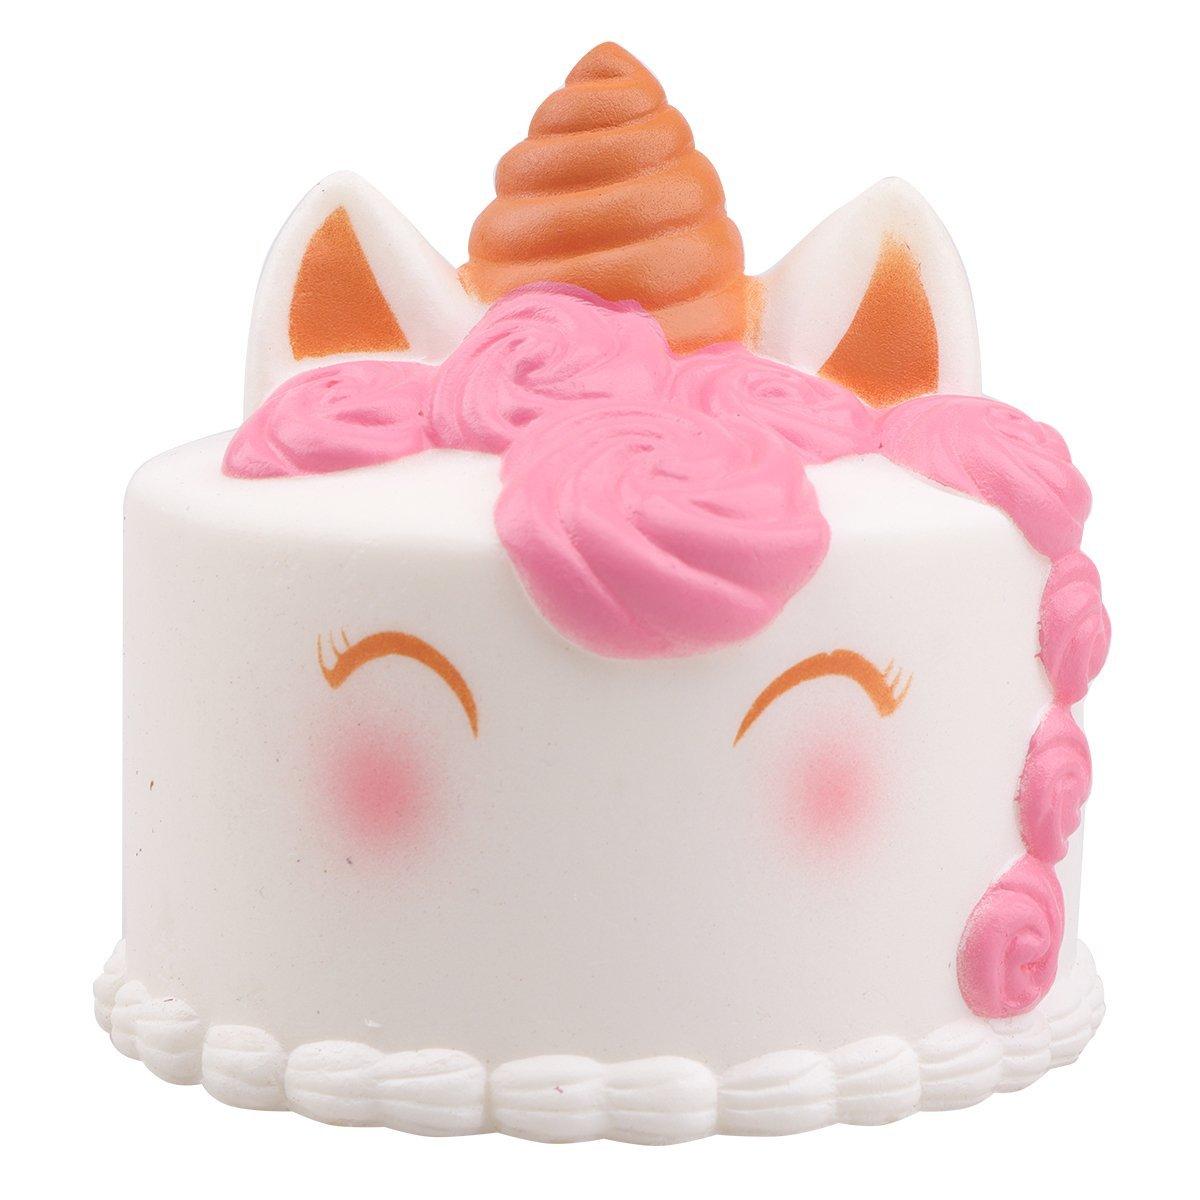 Squishies Mini Cute Kawaii Squishy Soft Animal Kids Gift Toy 30% OFF @$6.99+FS